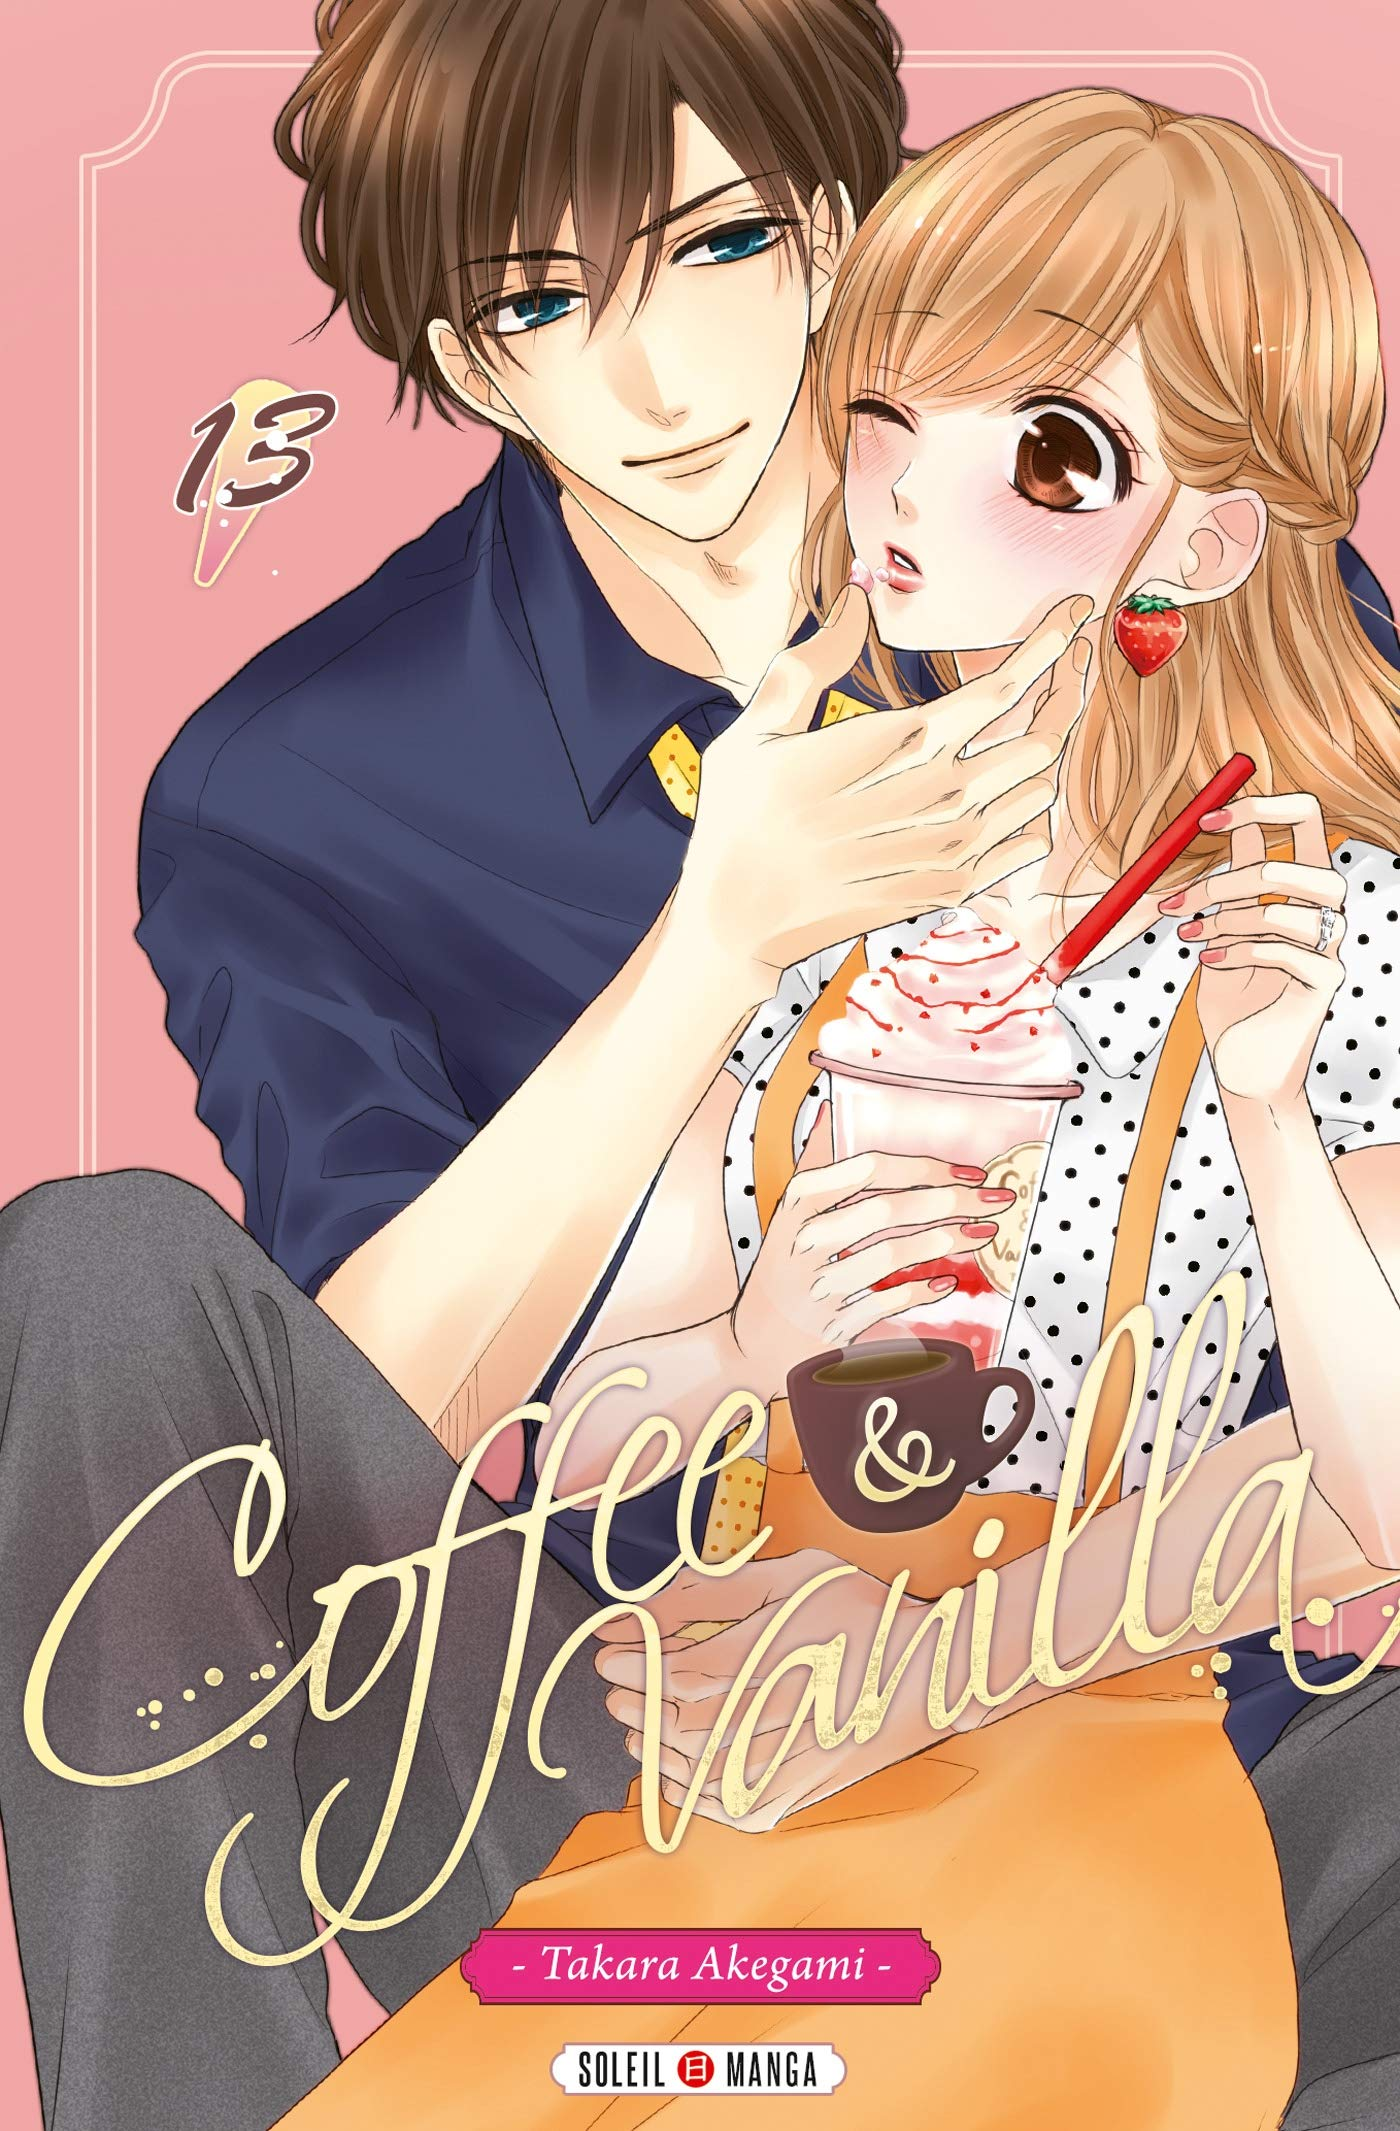 Coffee & Vanilla 13